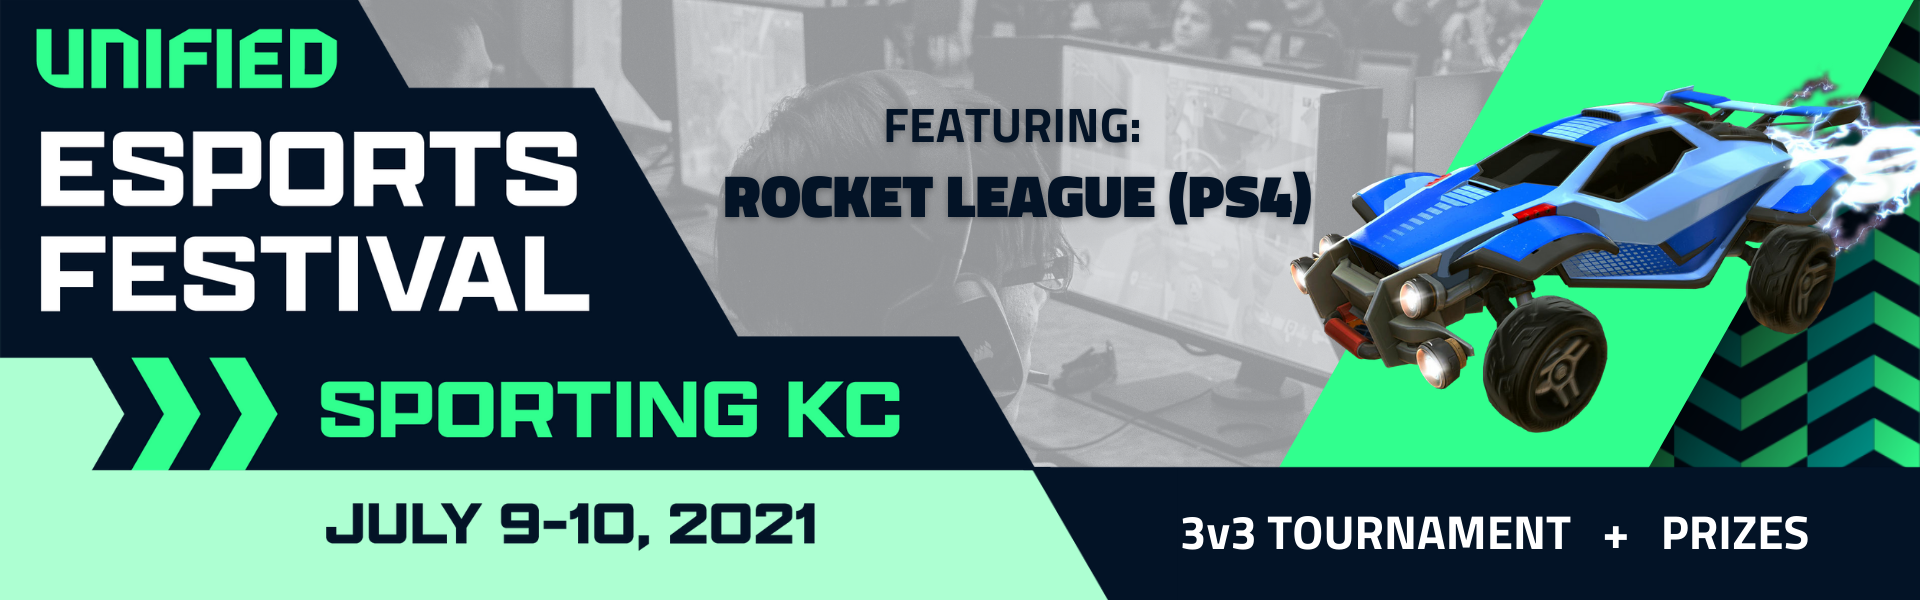 EF:SKC Featuring Rocket League (PS4)